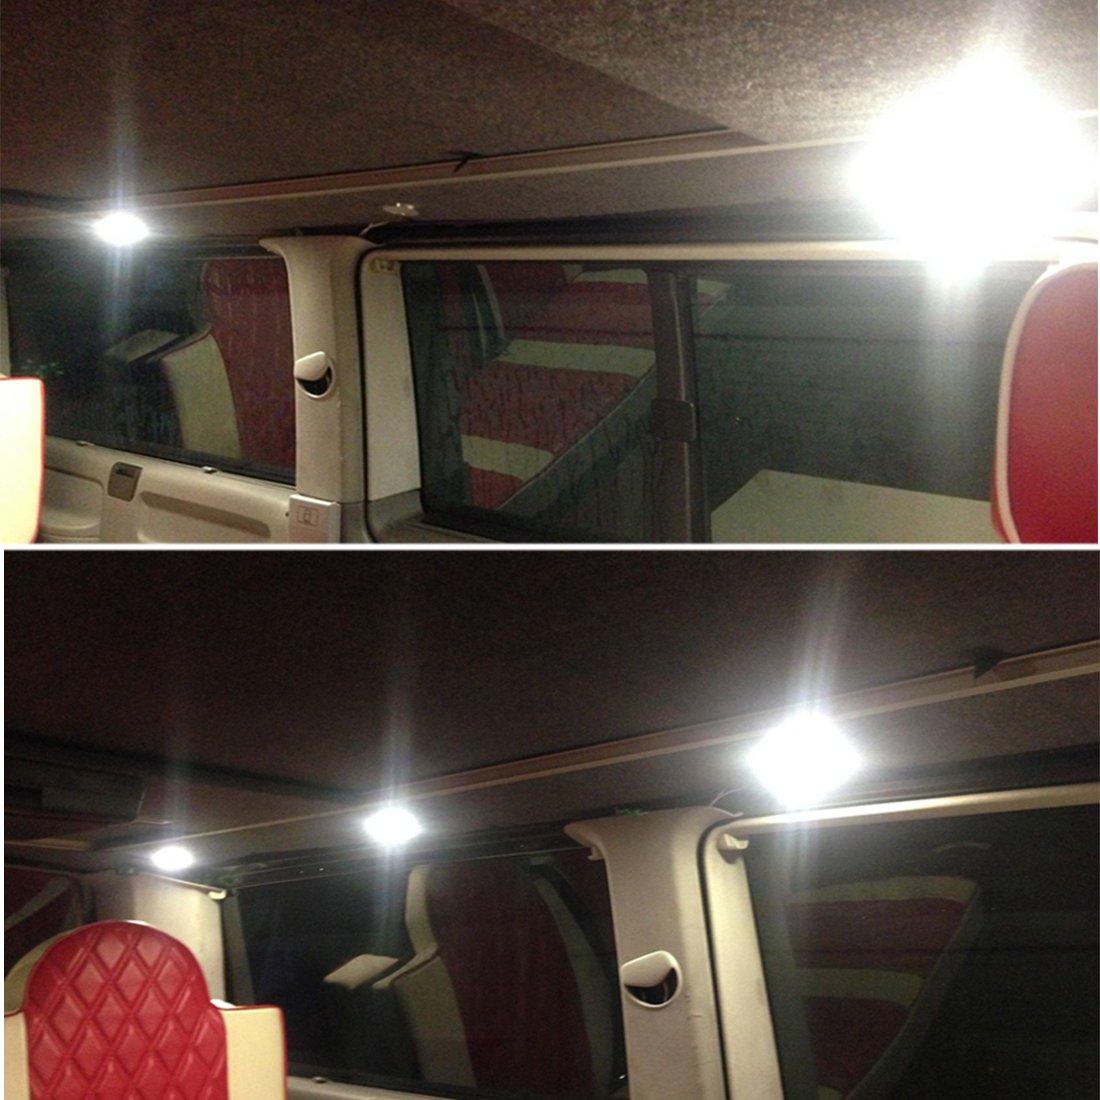 interior spot lighting. 12V Interior LED Spot Lights Recessed Ceiling Light For X6 T4 T5 Transporter Camper VAN Boat, Pack Of 6: Amazon.co.uk: Car \u0026 Motorbike Lighting